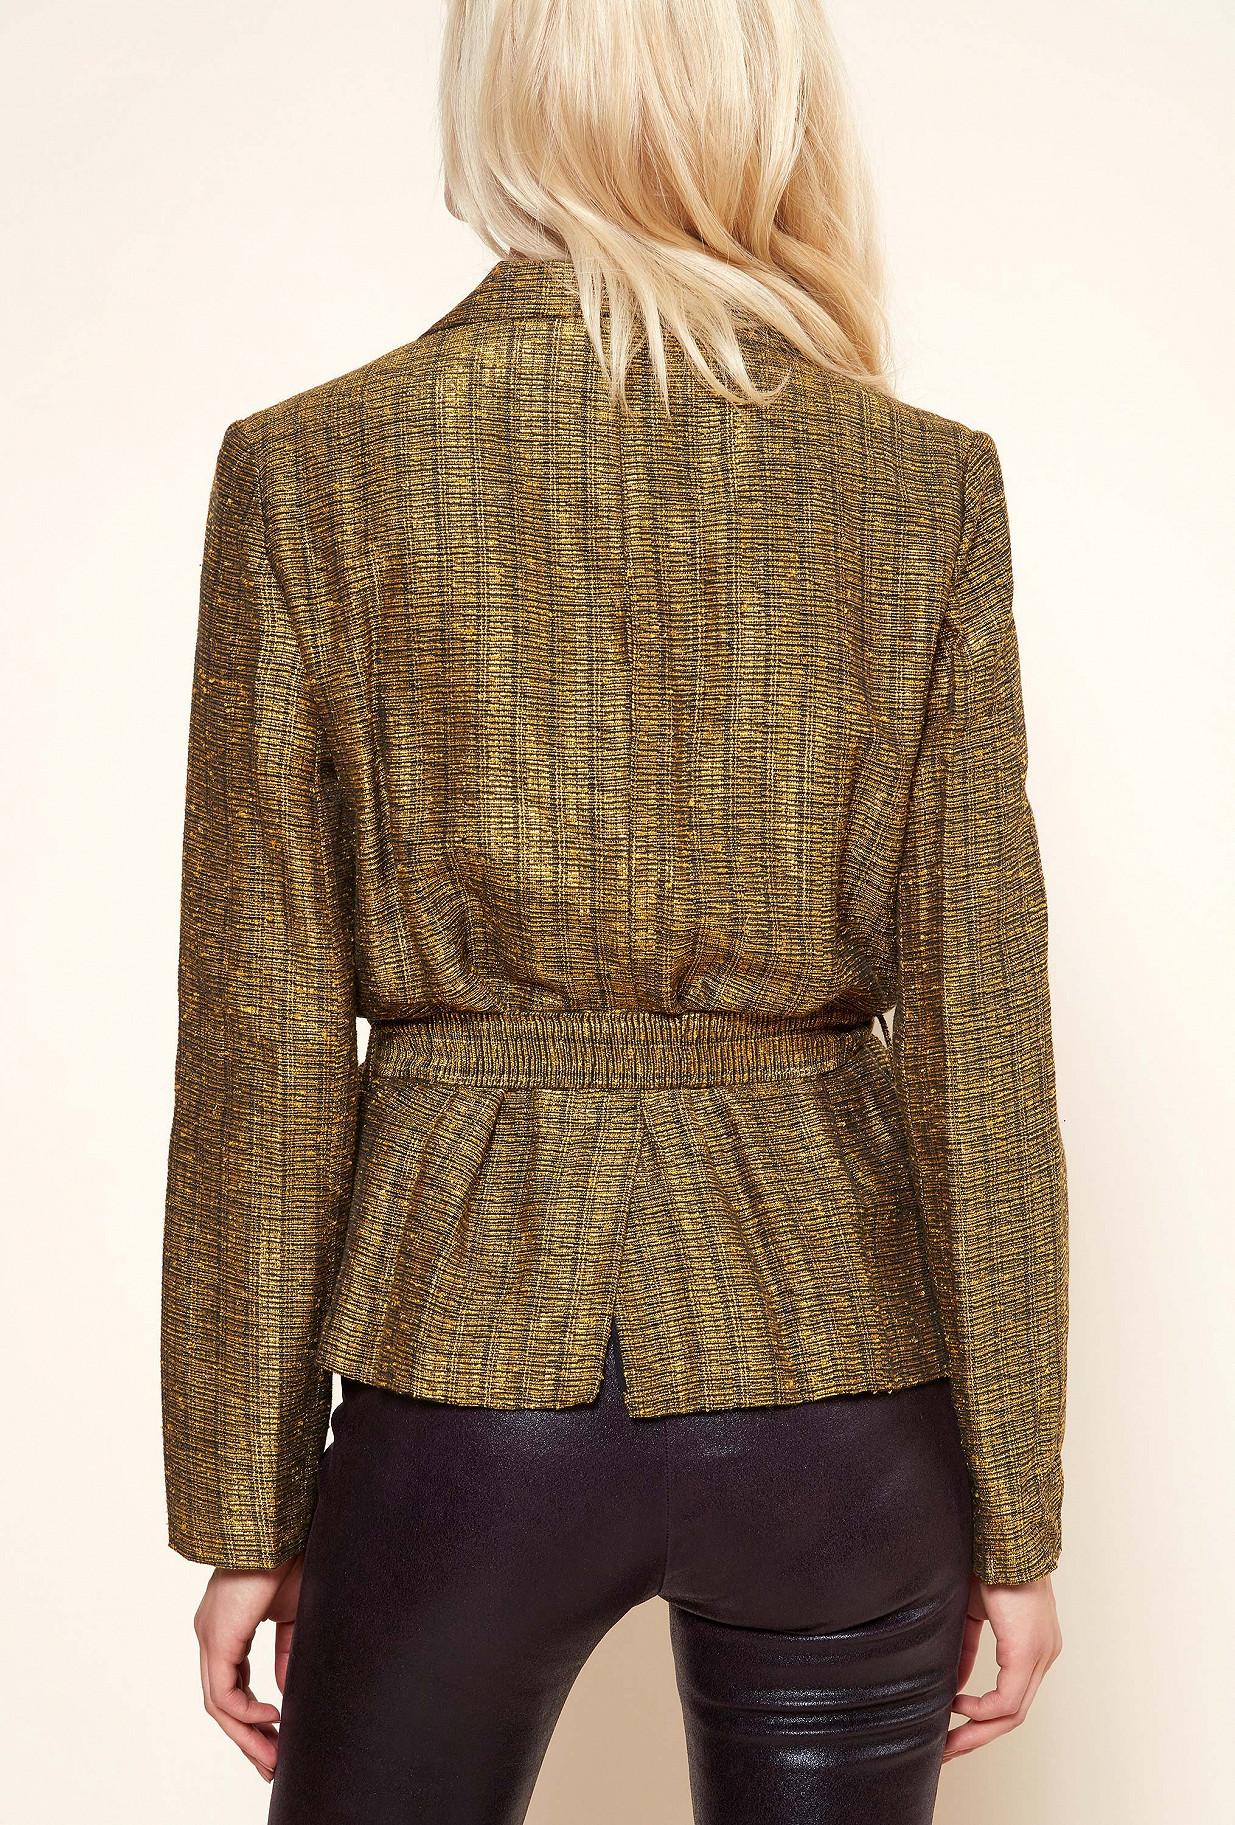 clothes store JACKET  Sledge french designer fashion Paris